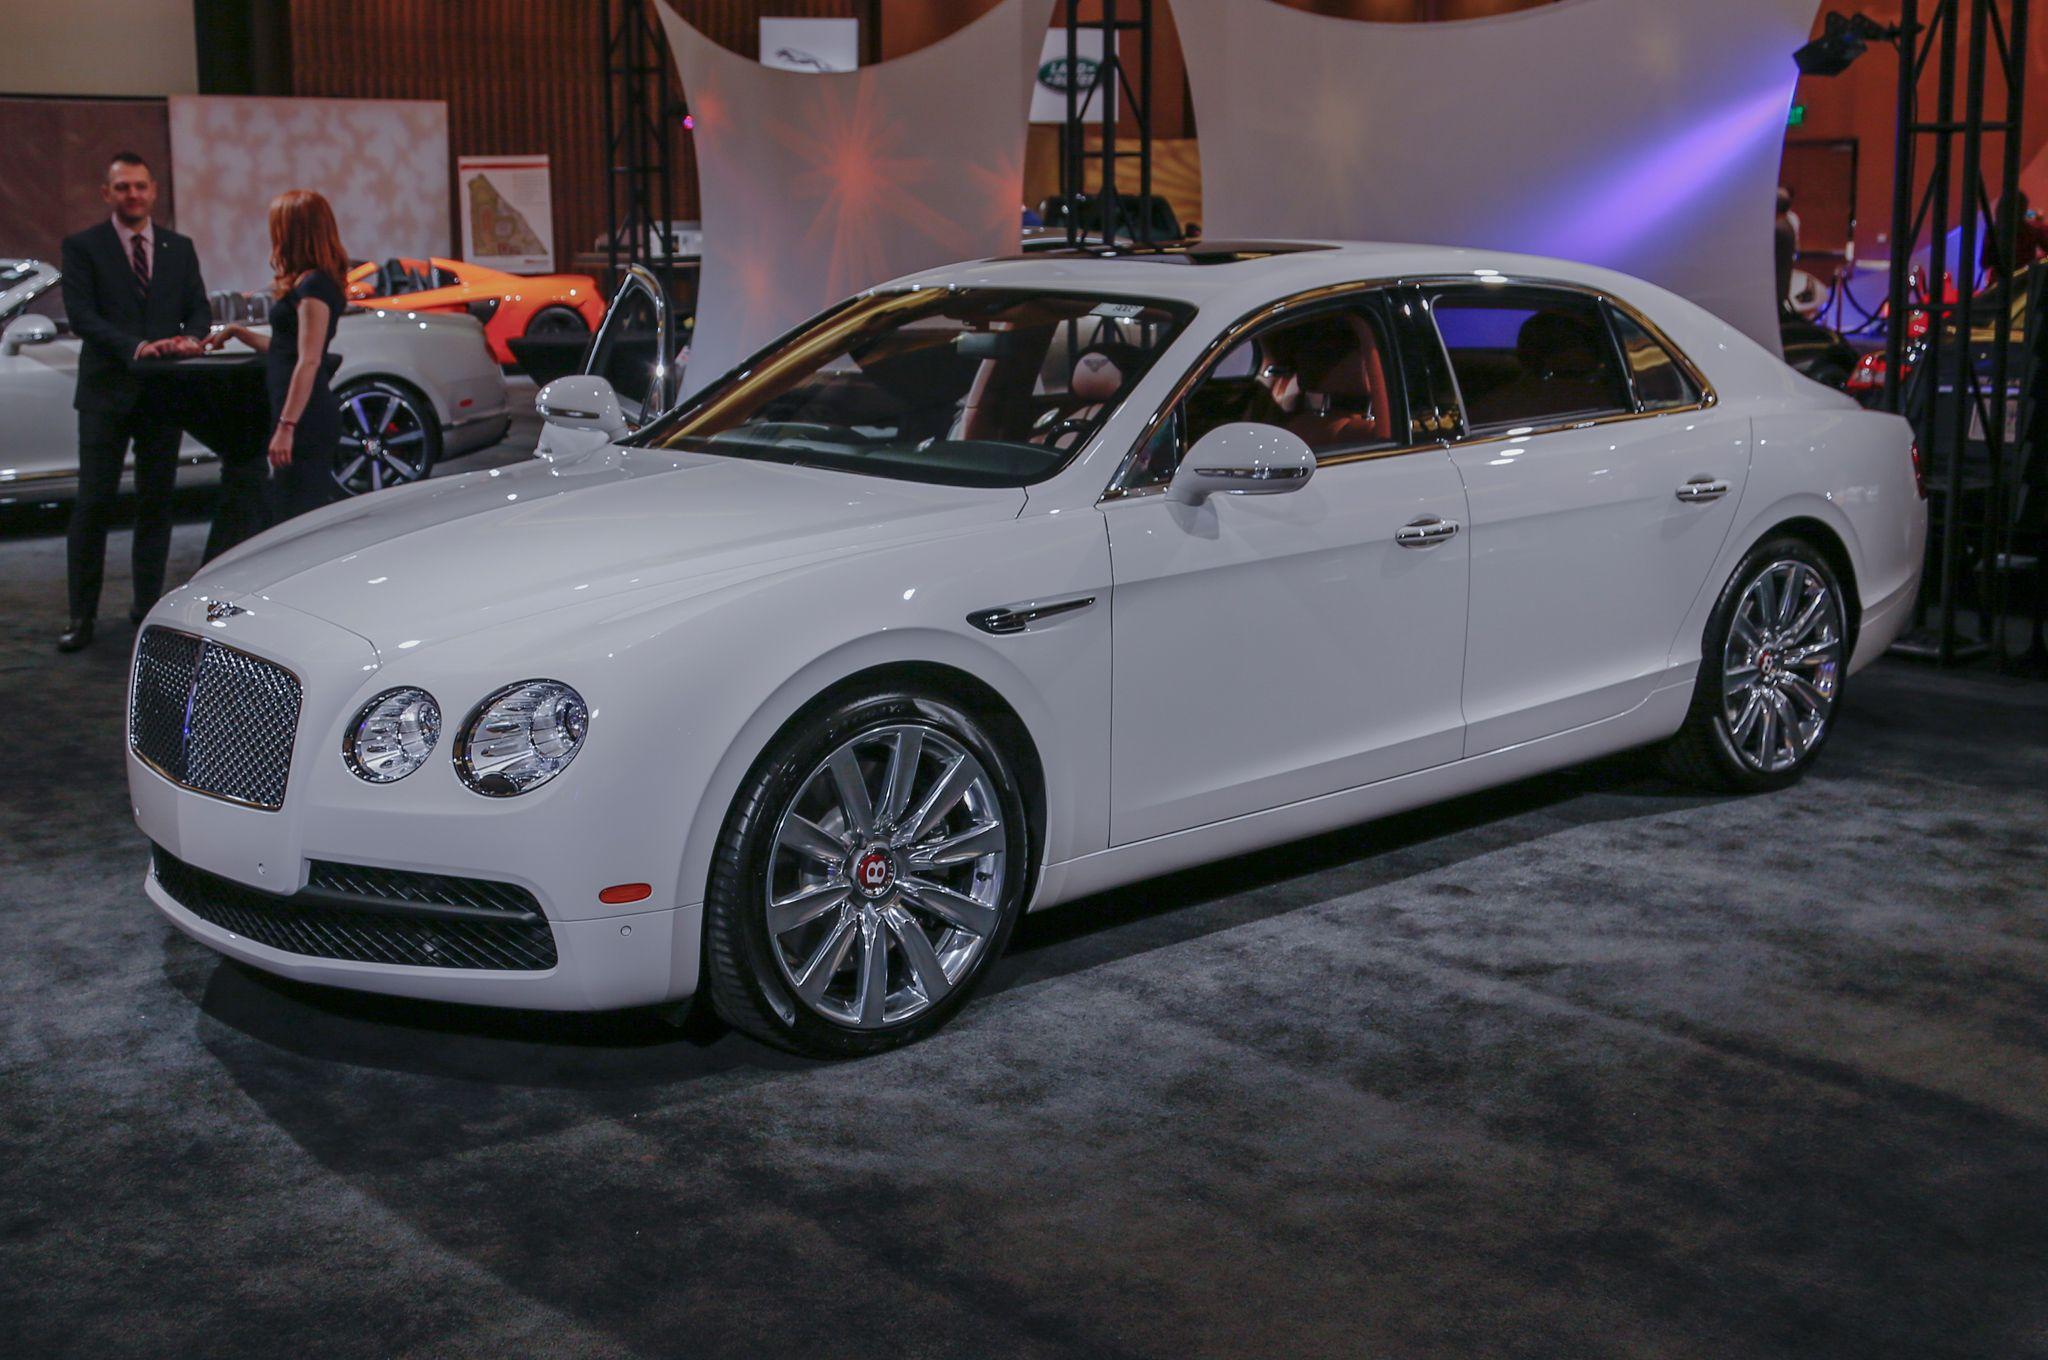 Image result for 2014 Bentley Flying Spur Mansory 3